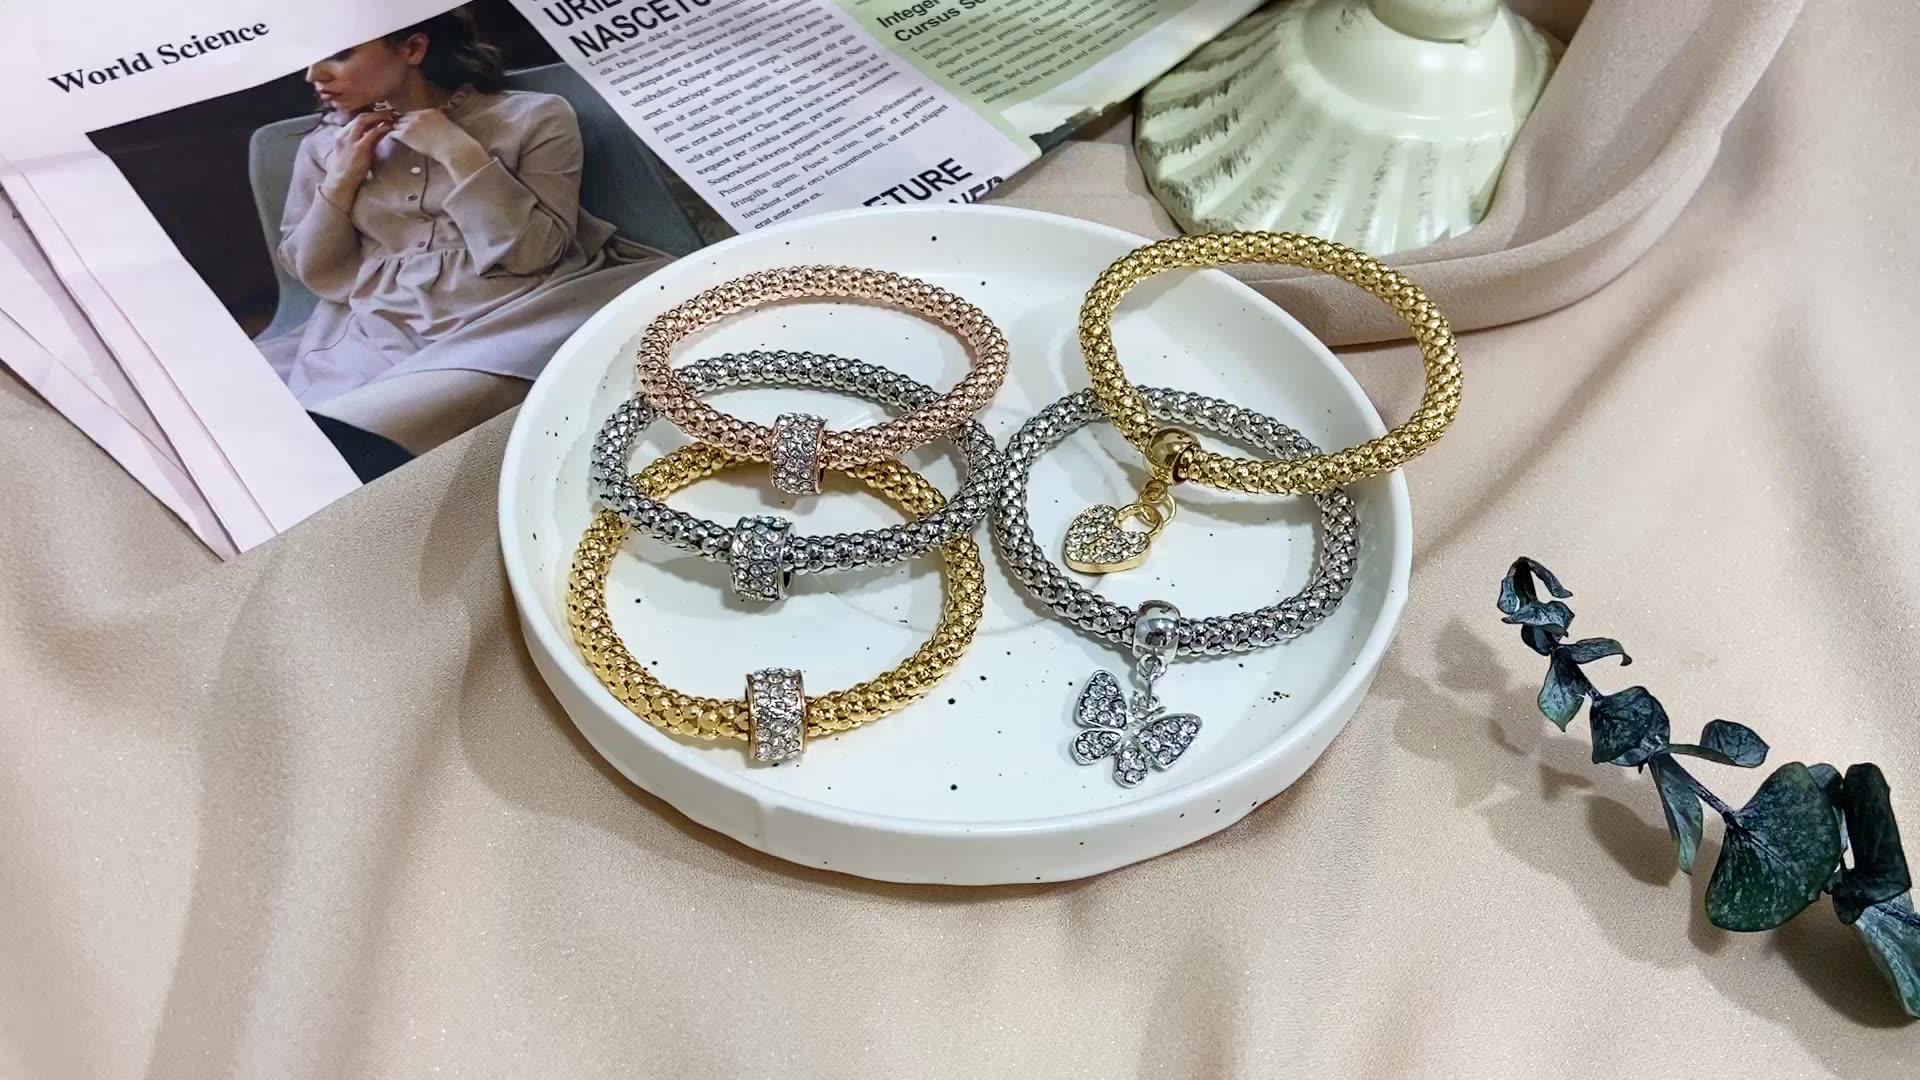 2020 Hot Selling 3 Pcs Crystal Butterfly Popcorn Elastic Bracelets Set Heart Lock Charm Bracelet for Women